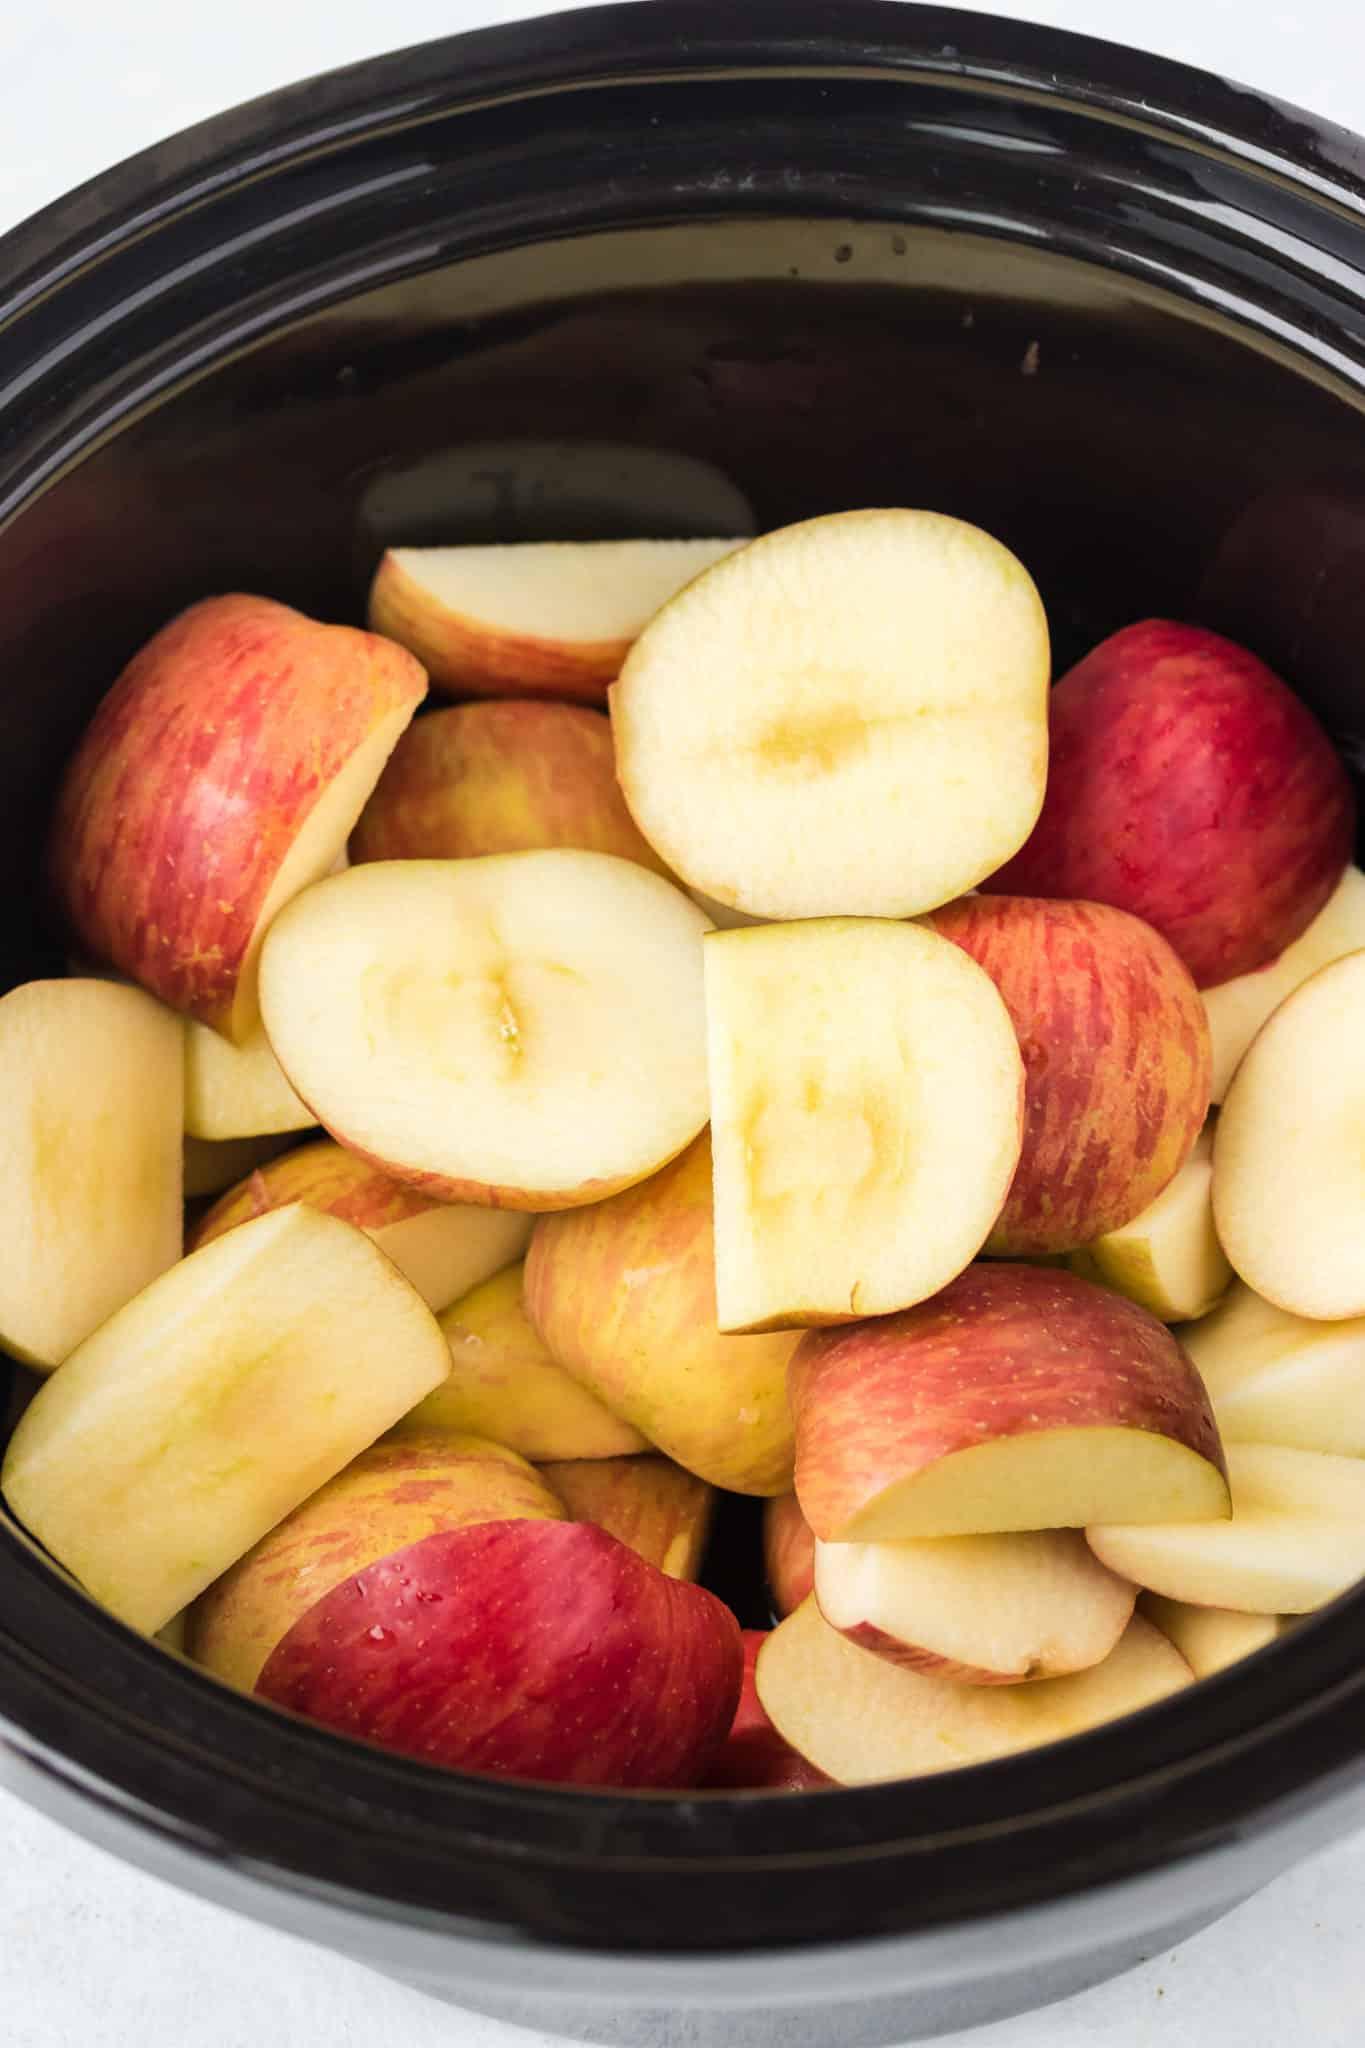 sliced apples inside of a crockpot